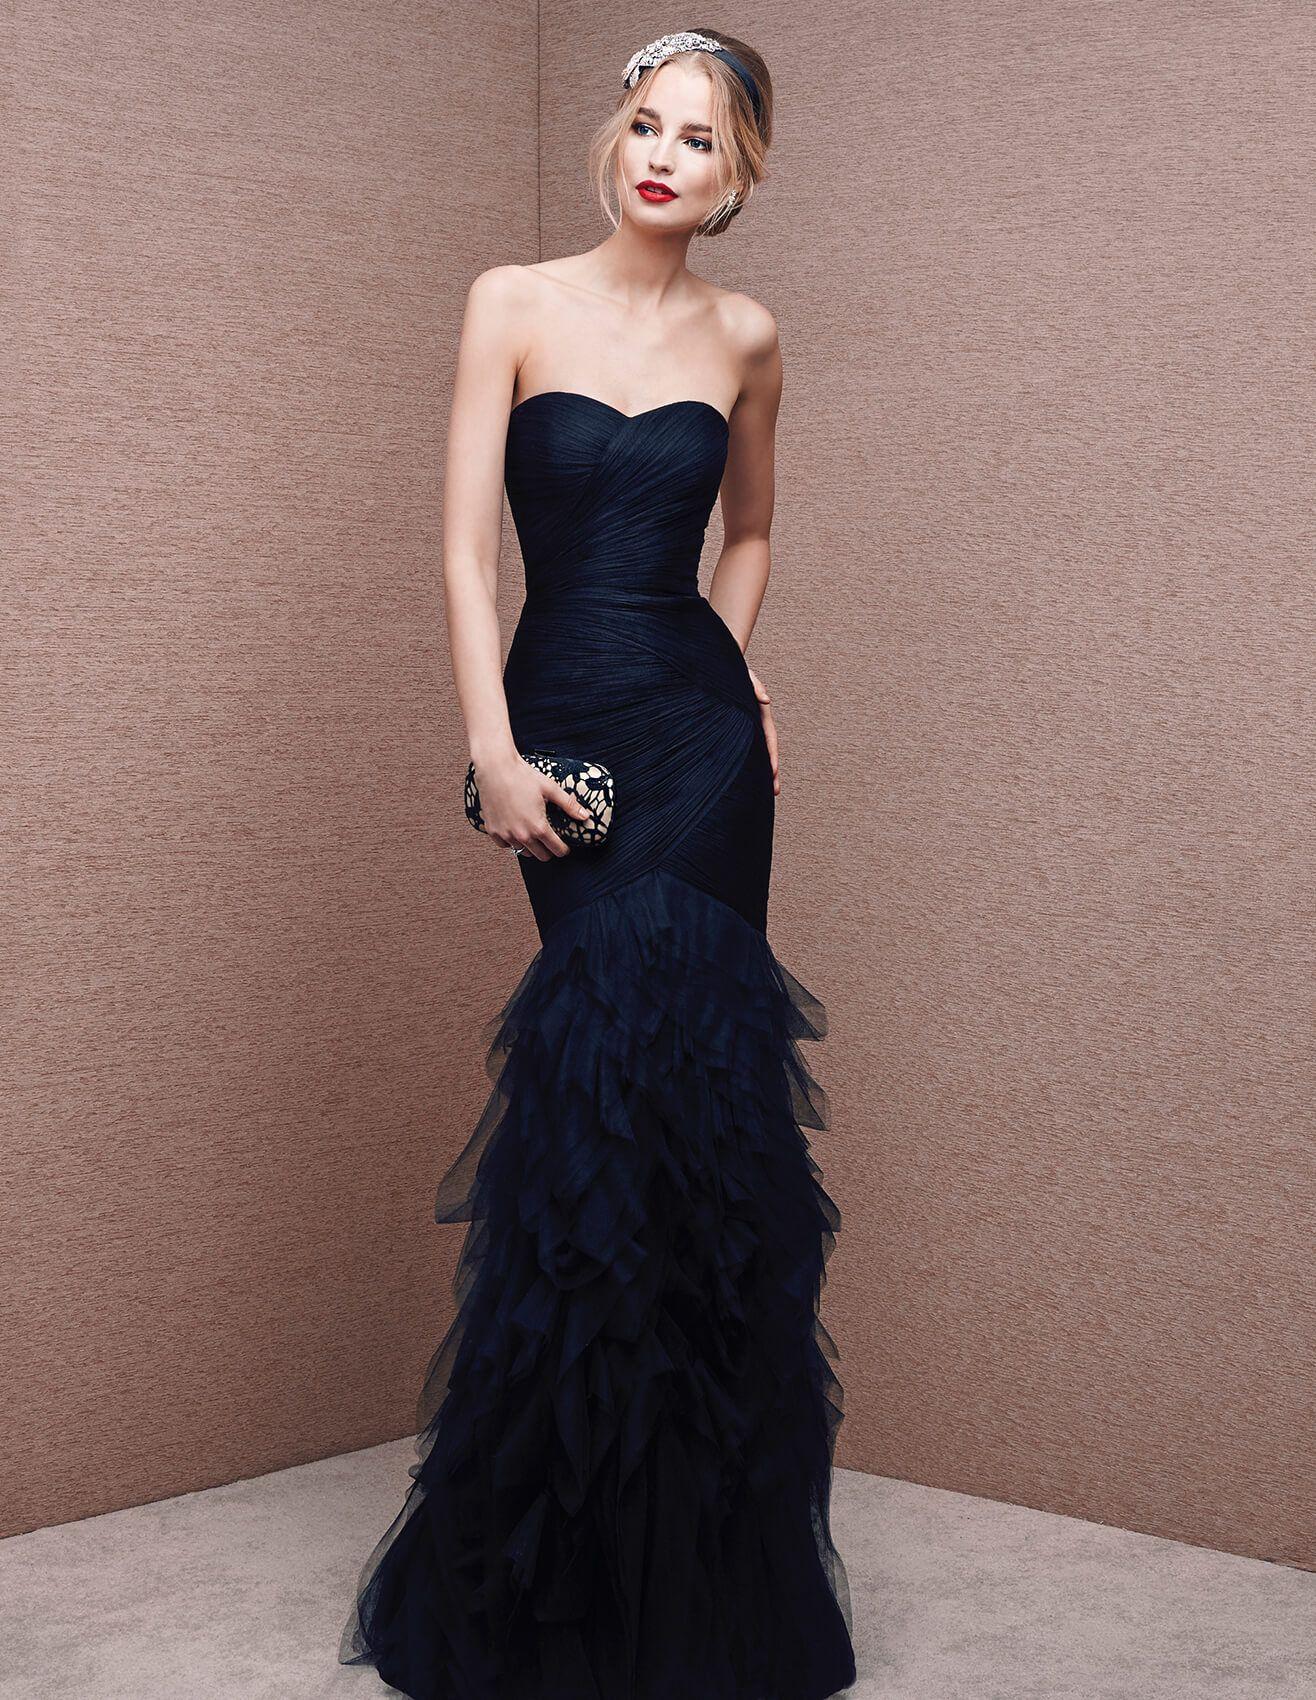 Brian black lurex dress